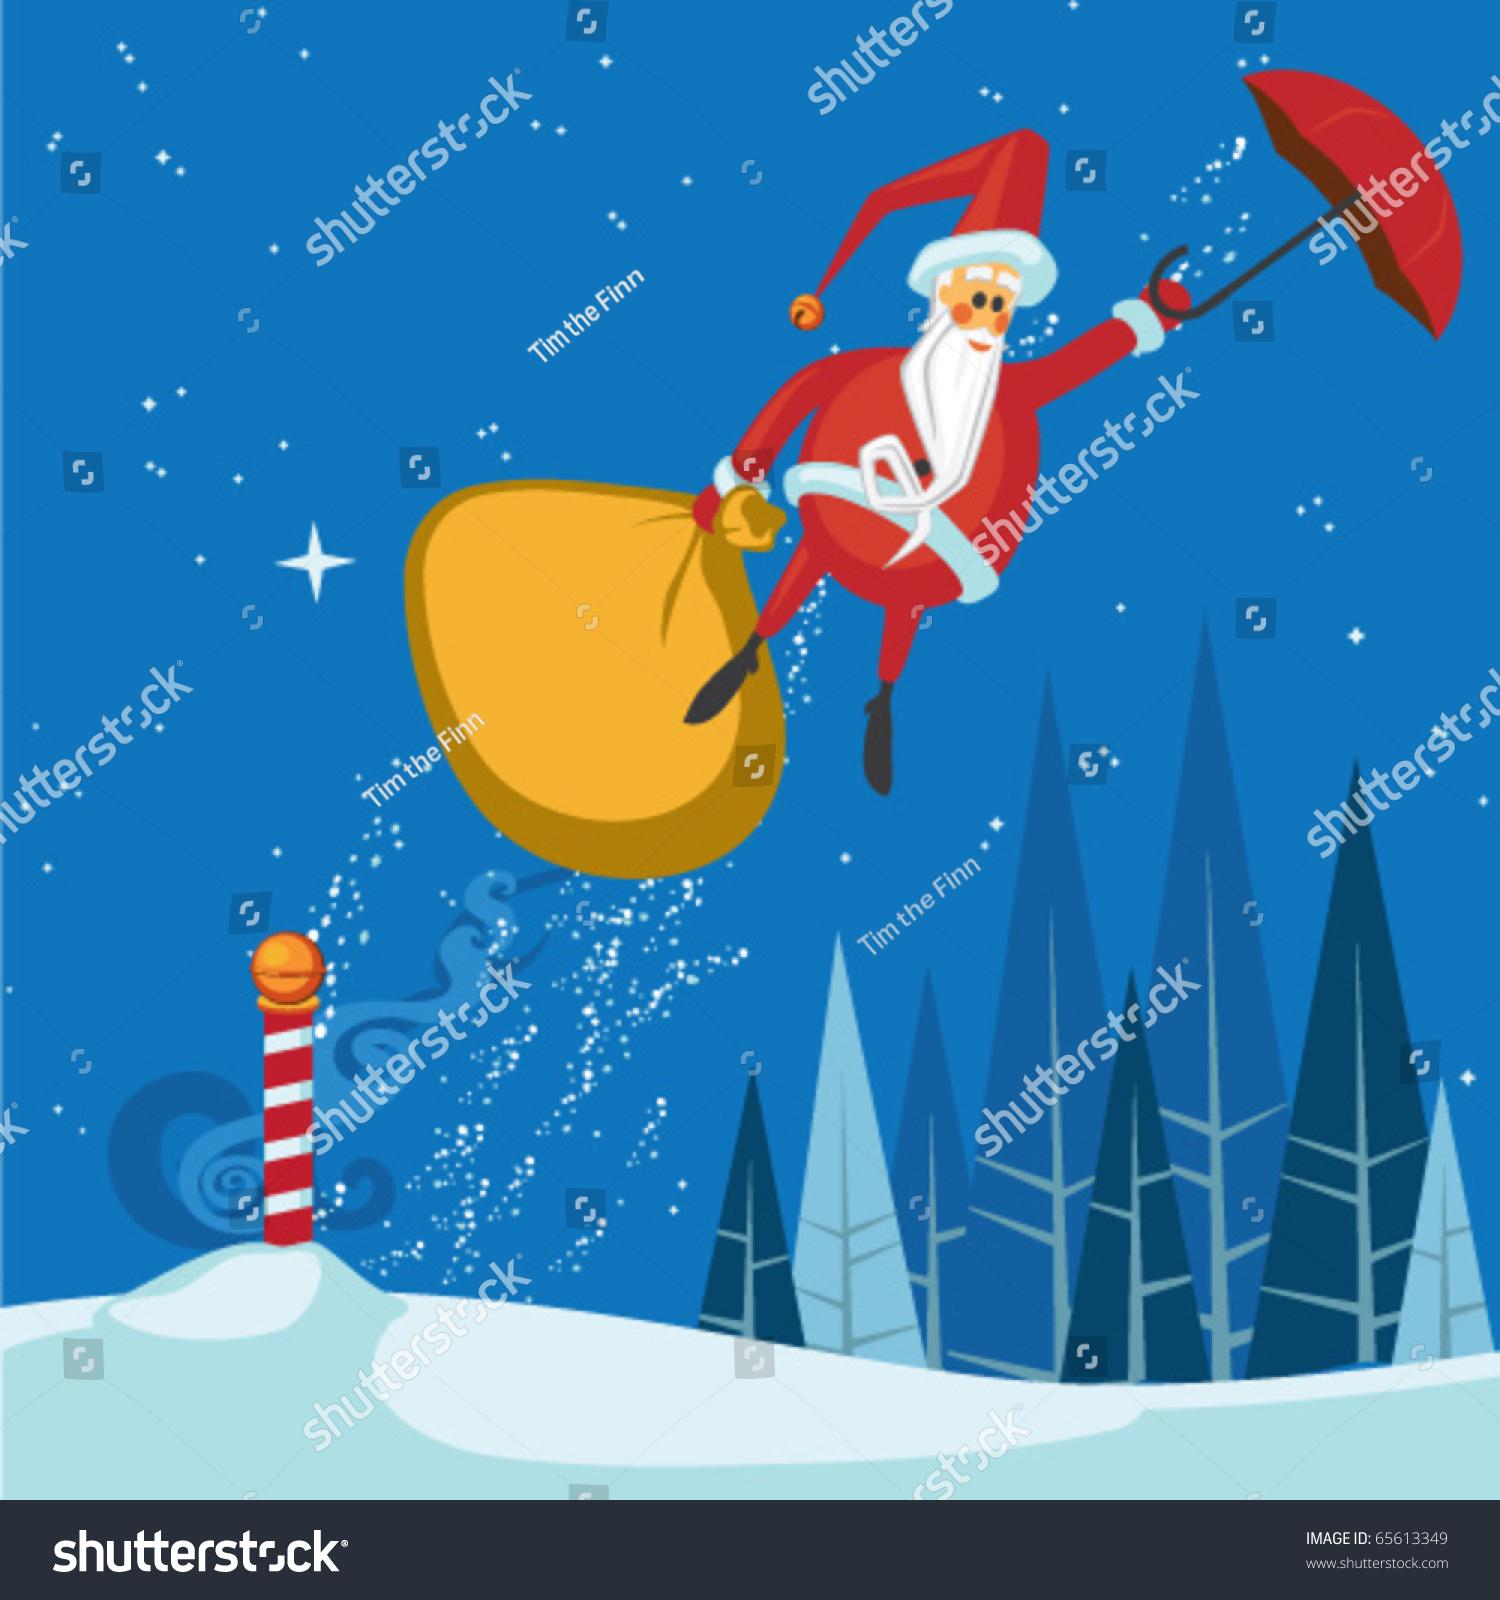 Santas Magic Umbrella Ride Stock Vector 65613349 - Shutterstock